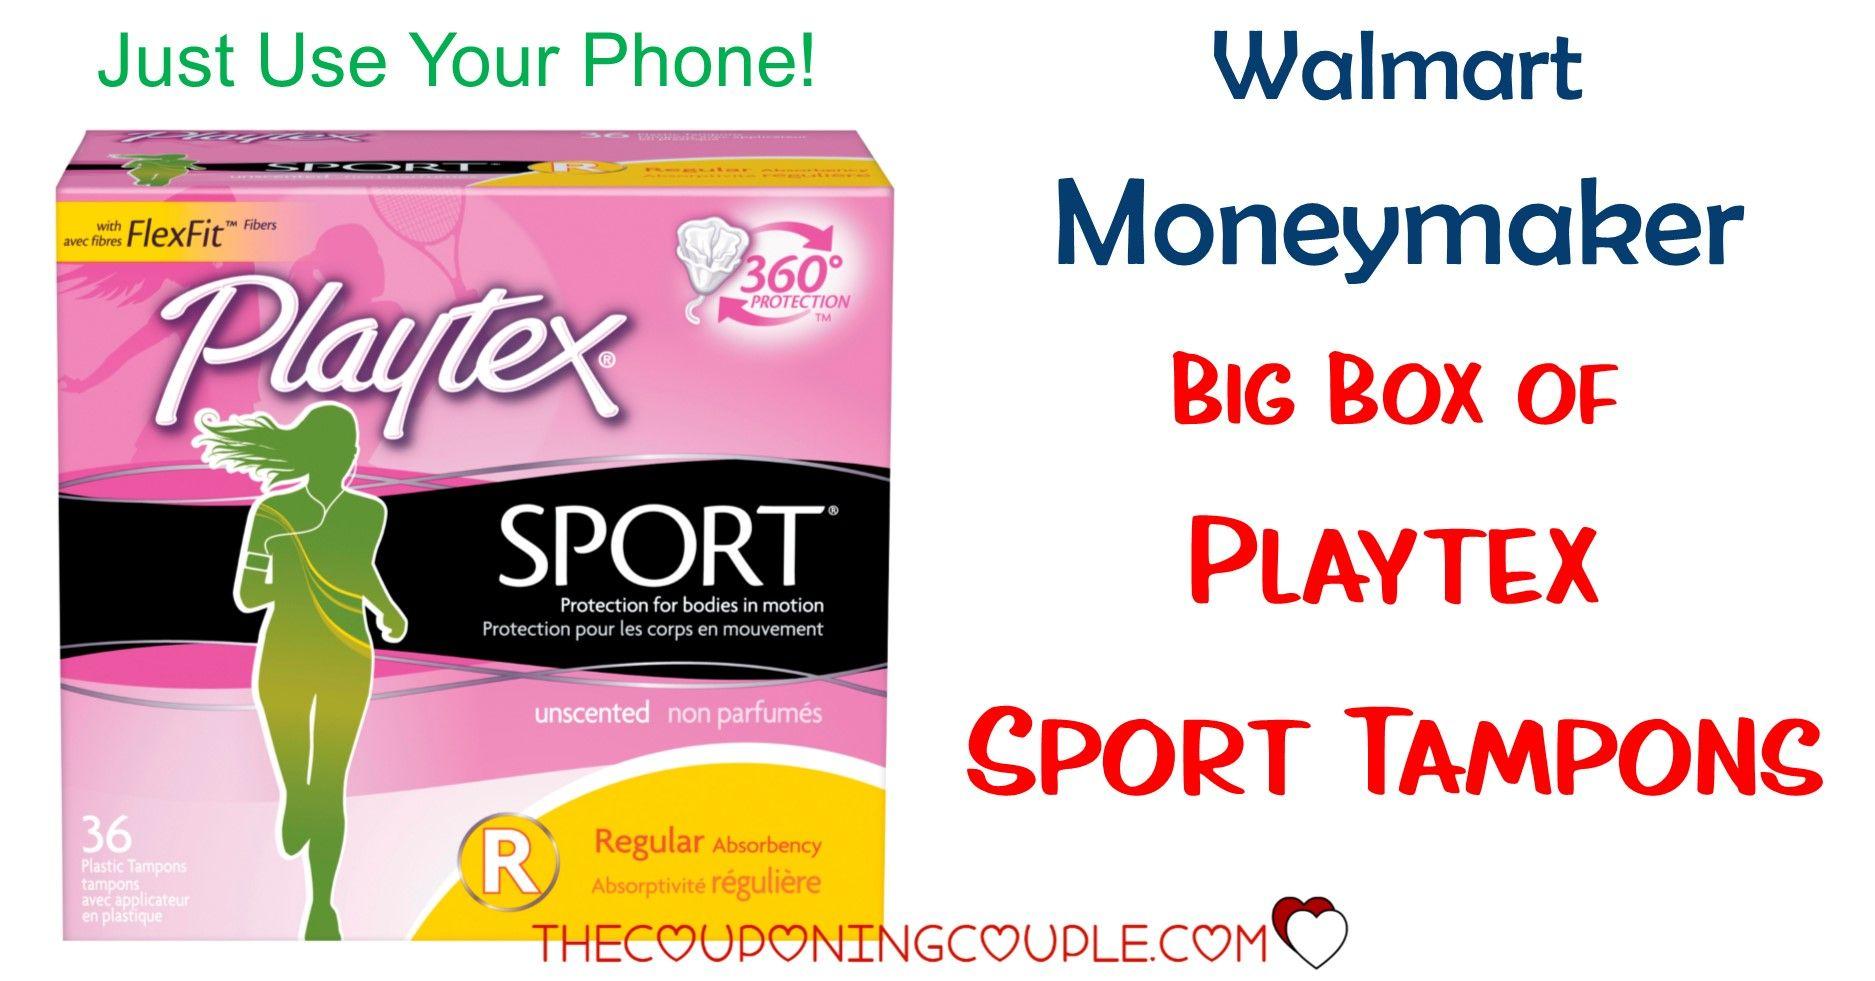 Playtex Sport Tampons MONEYMAKER at Kroger! Store ads